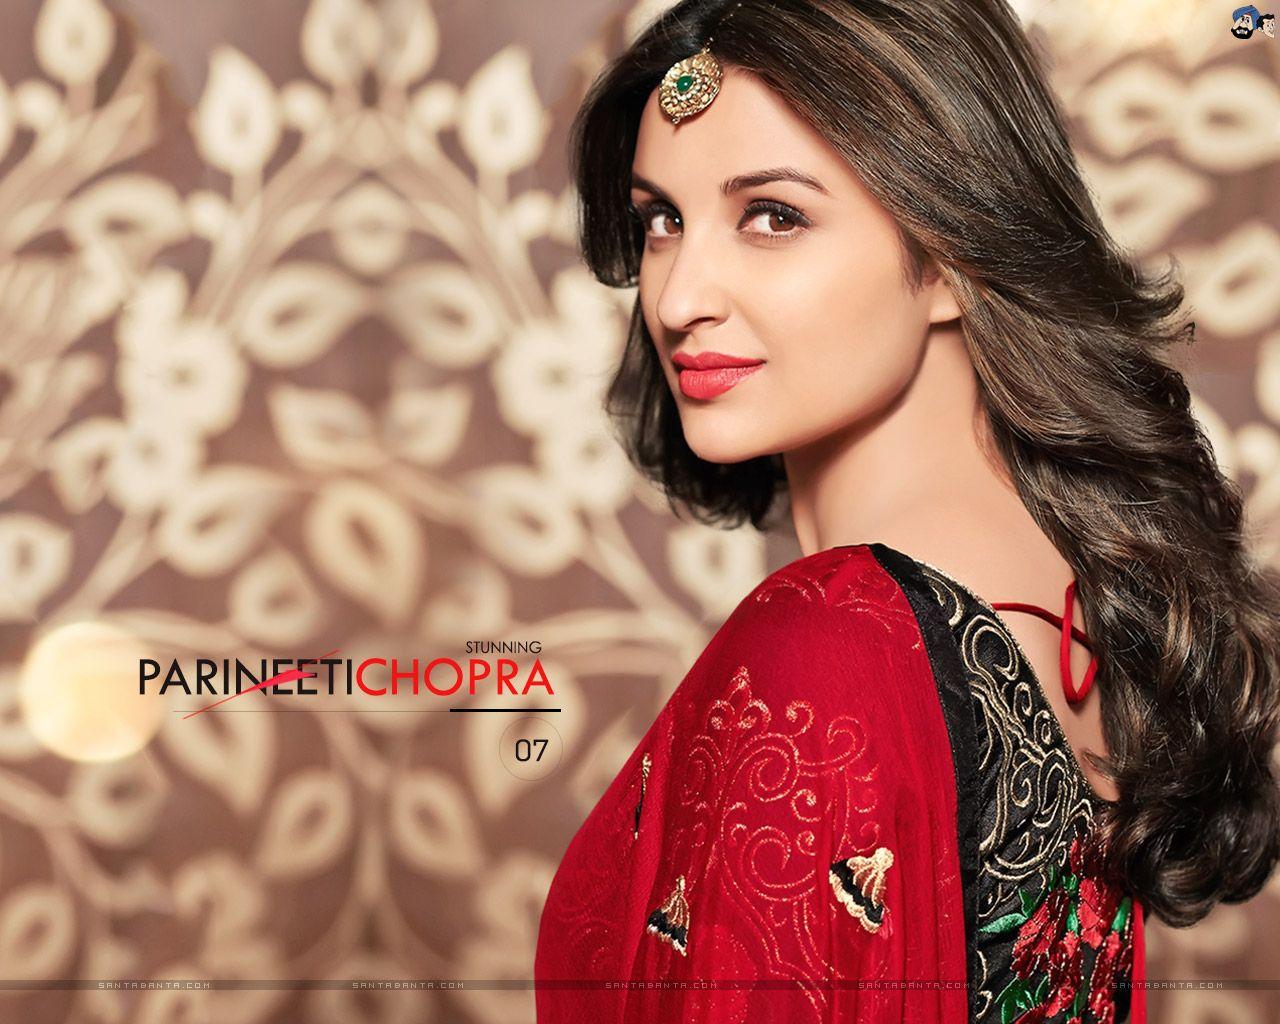 wanna kiss me guys - parineeti chopra -   global celebrities